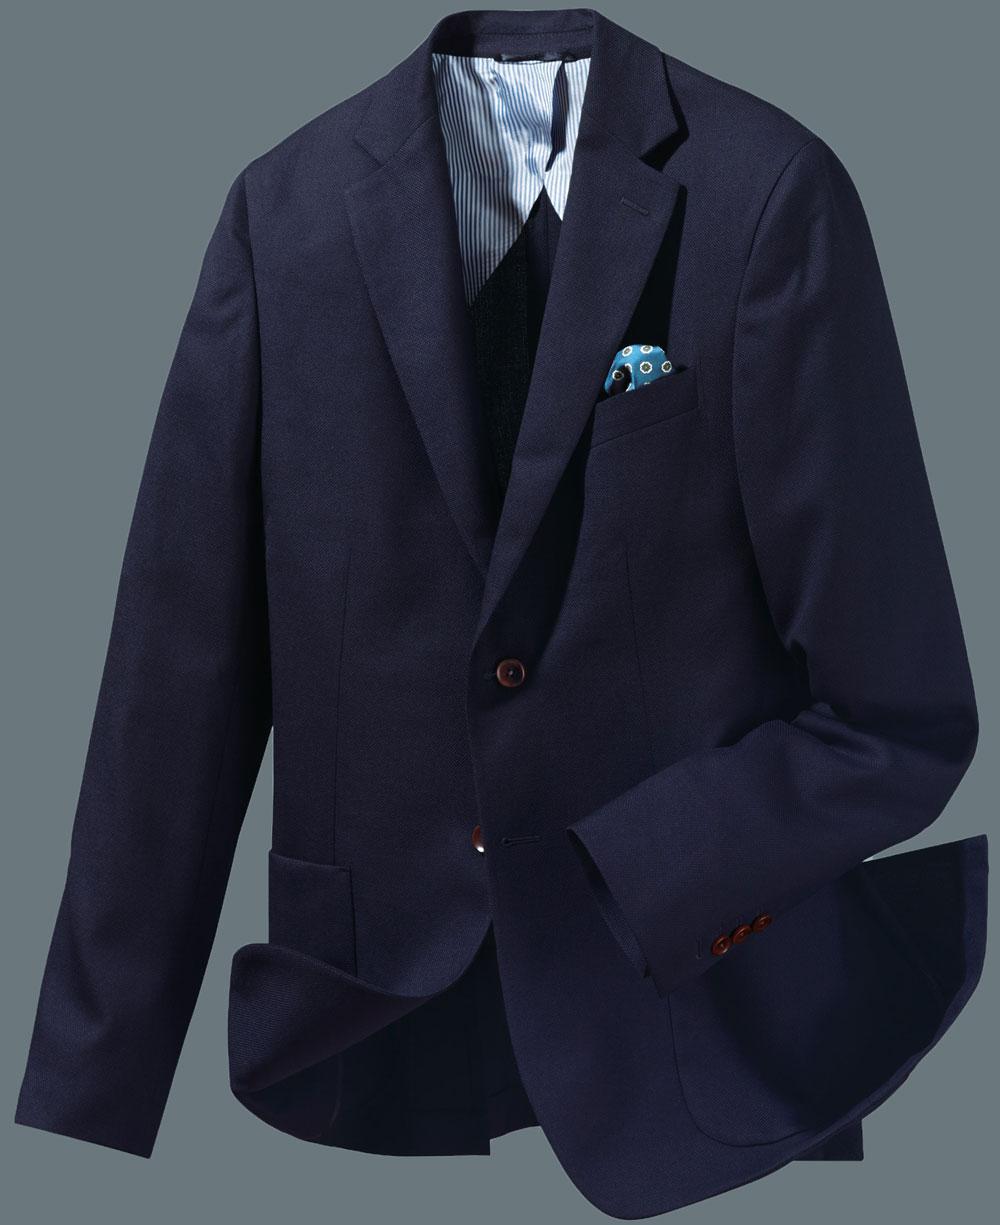 travel blazer image